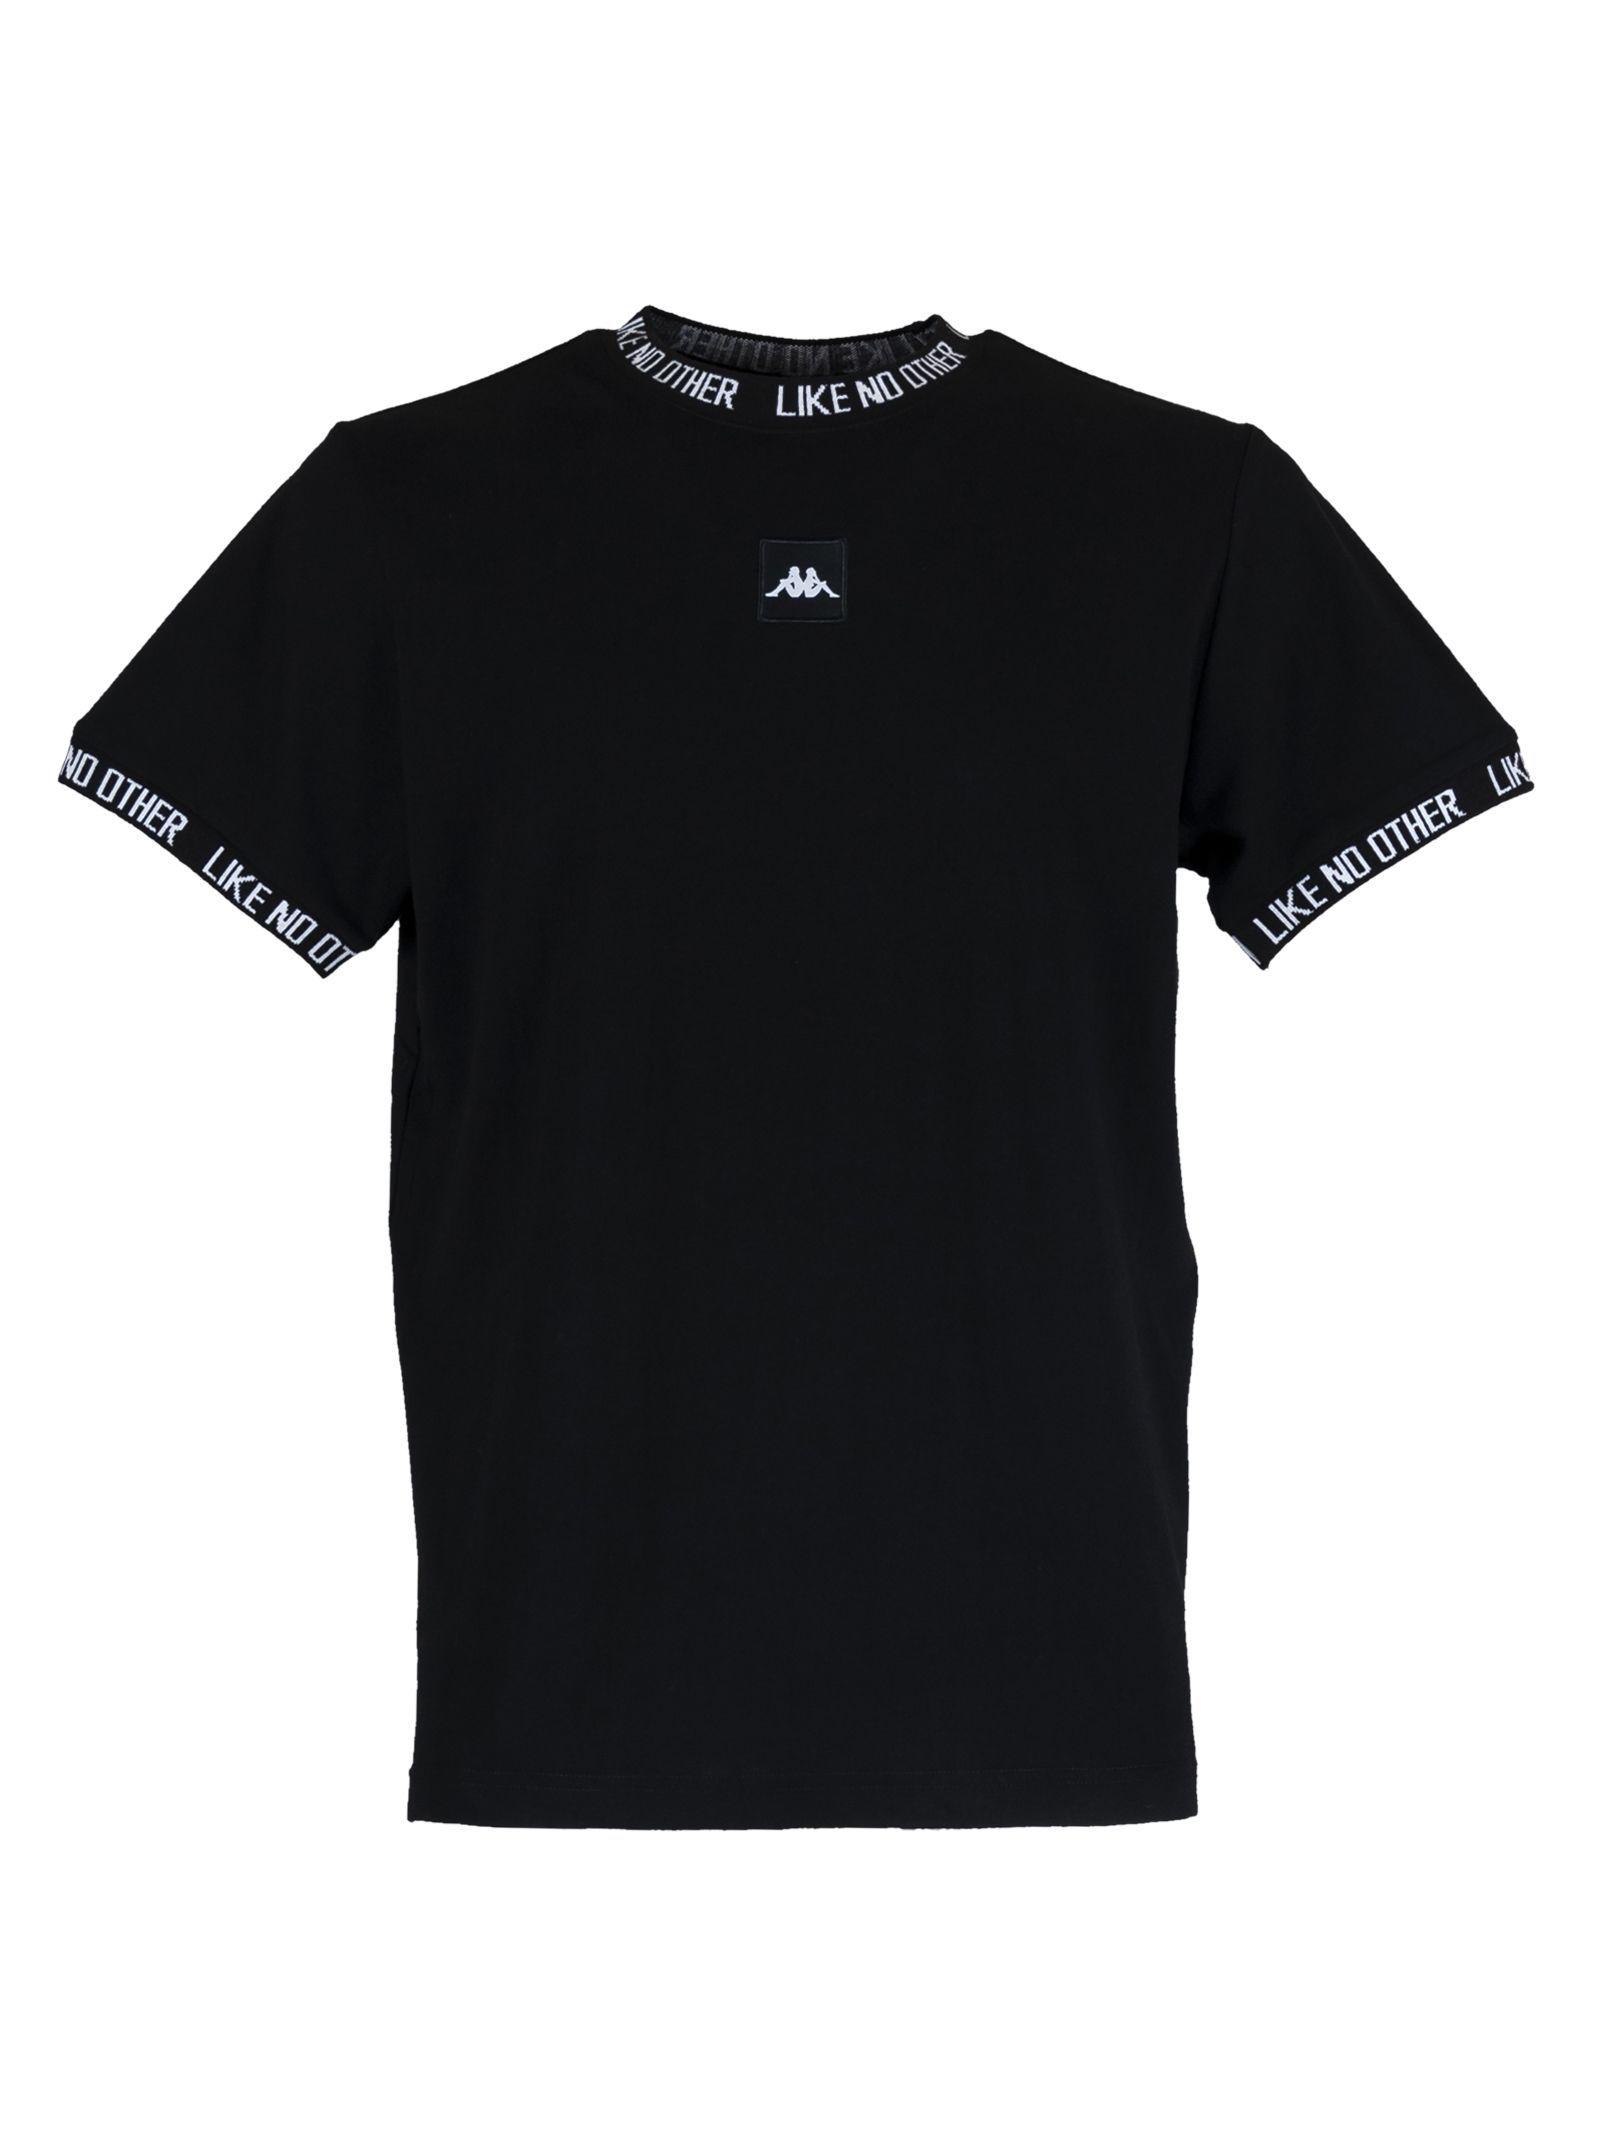 pelota local Historiador  Kappa Authentic Basco Tee In Nero/bianco | ModeSens | Nike mens shirts,  Kappa clothing, Mens clothing styles